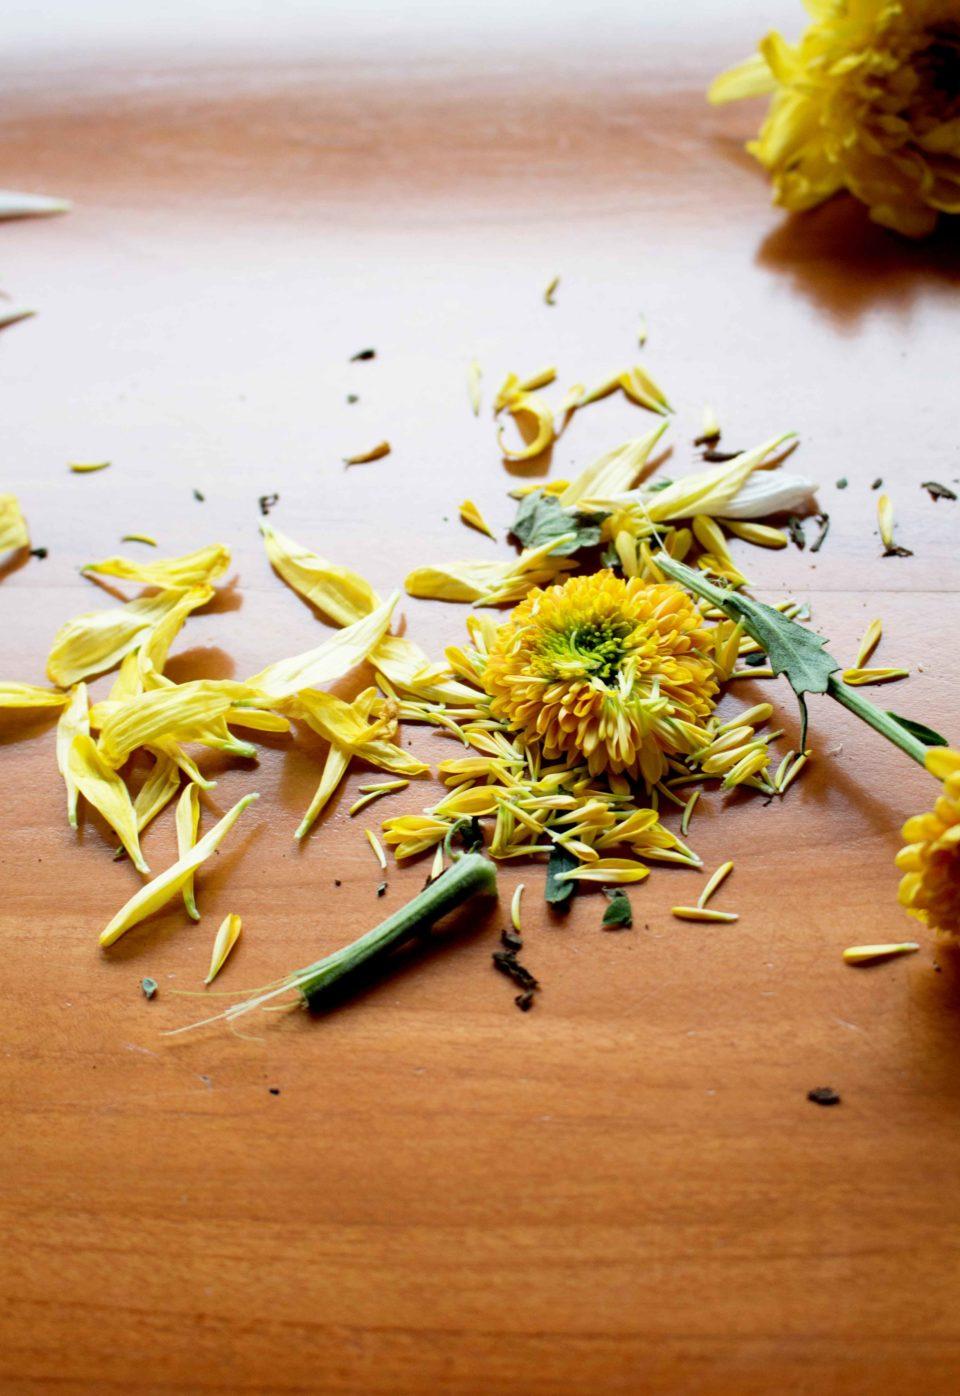 Chrysanthemum (Chrysanthemum.sp) - Benny Sanjaya